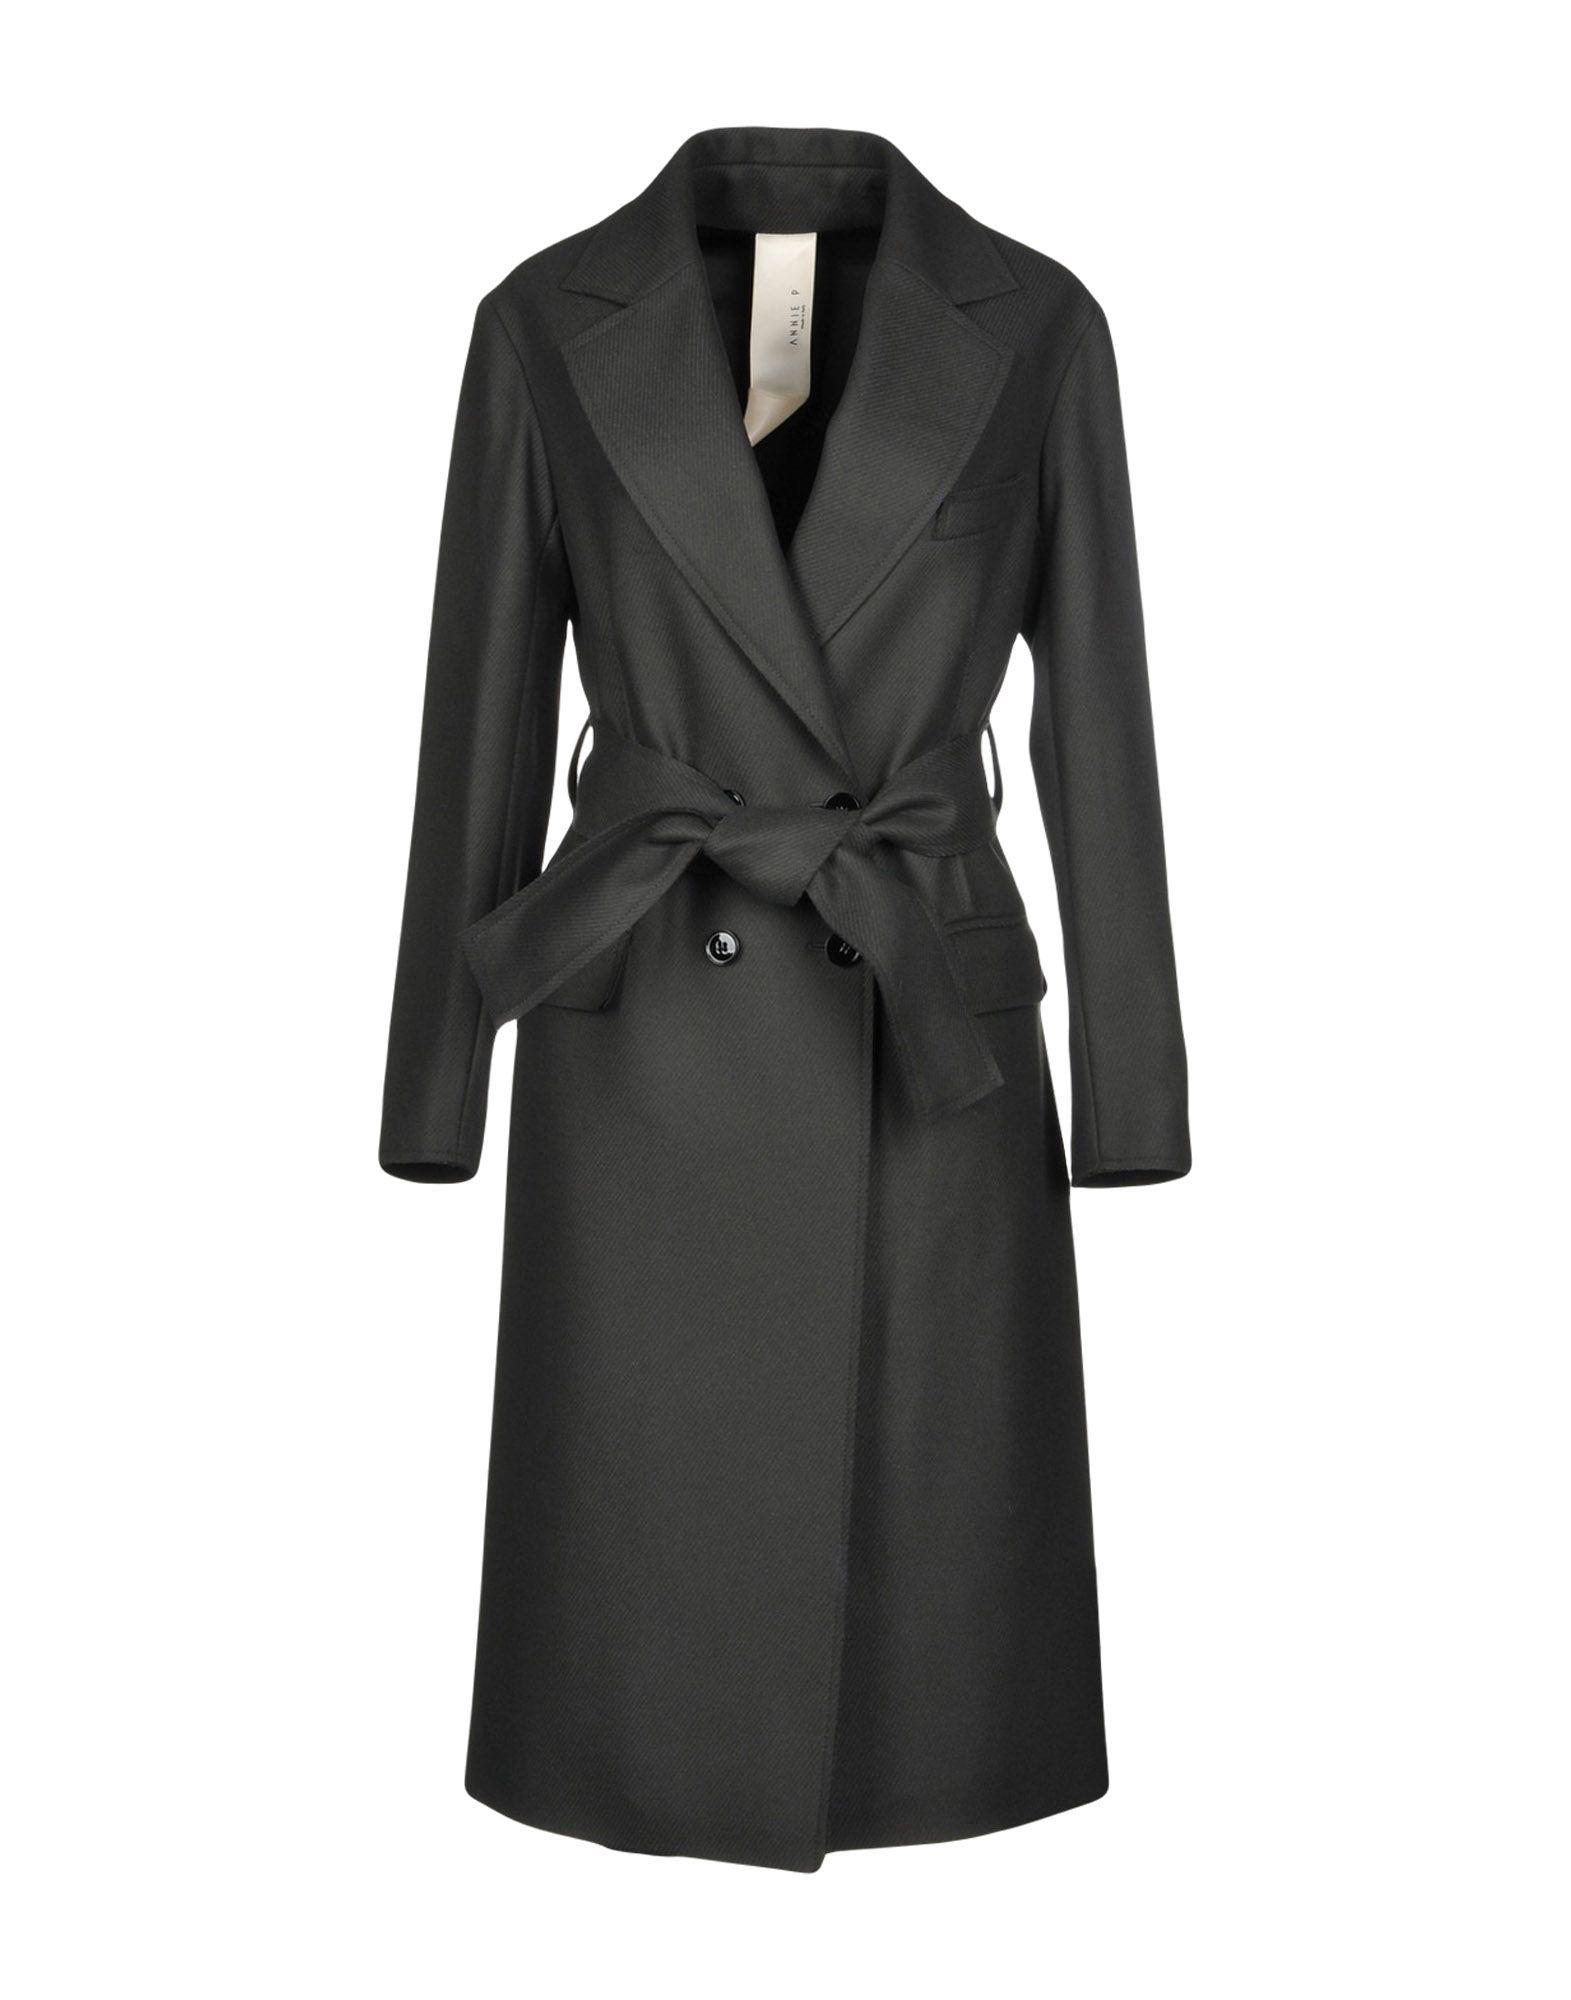 ANNIE P. Пальто 2016 осенью дамы сукно slim шерстяные пальто в длинные пальто